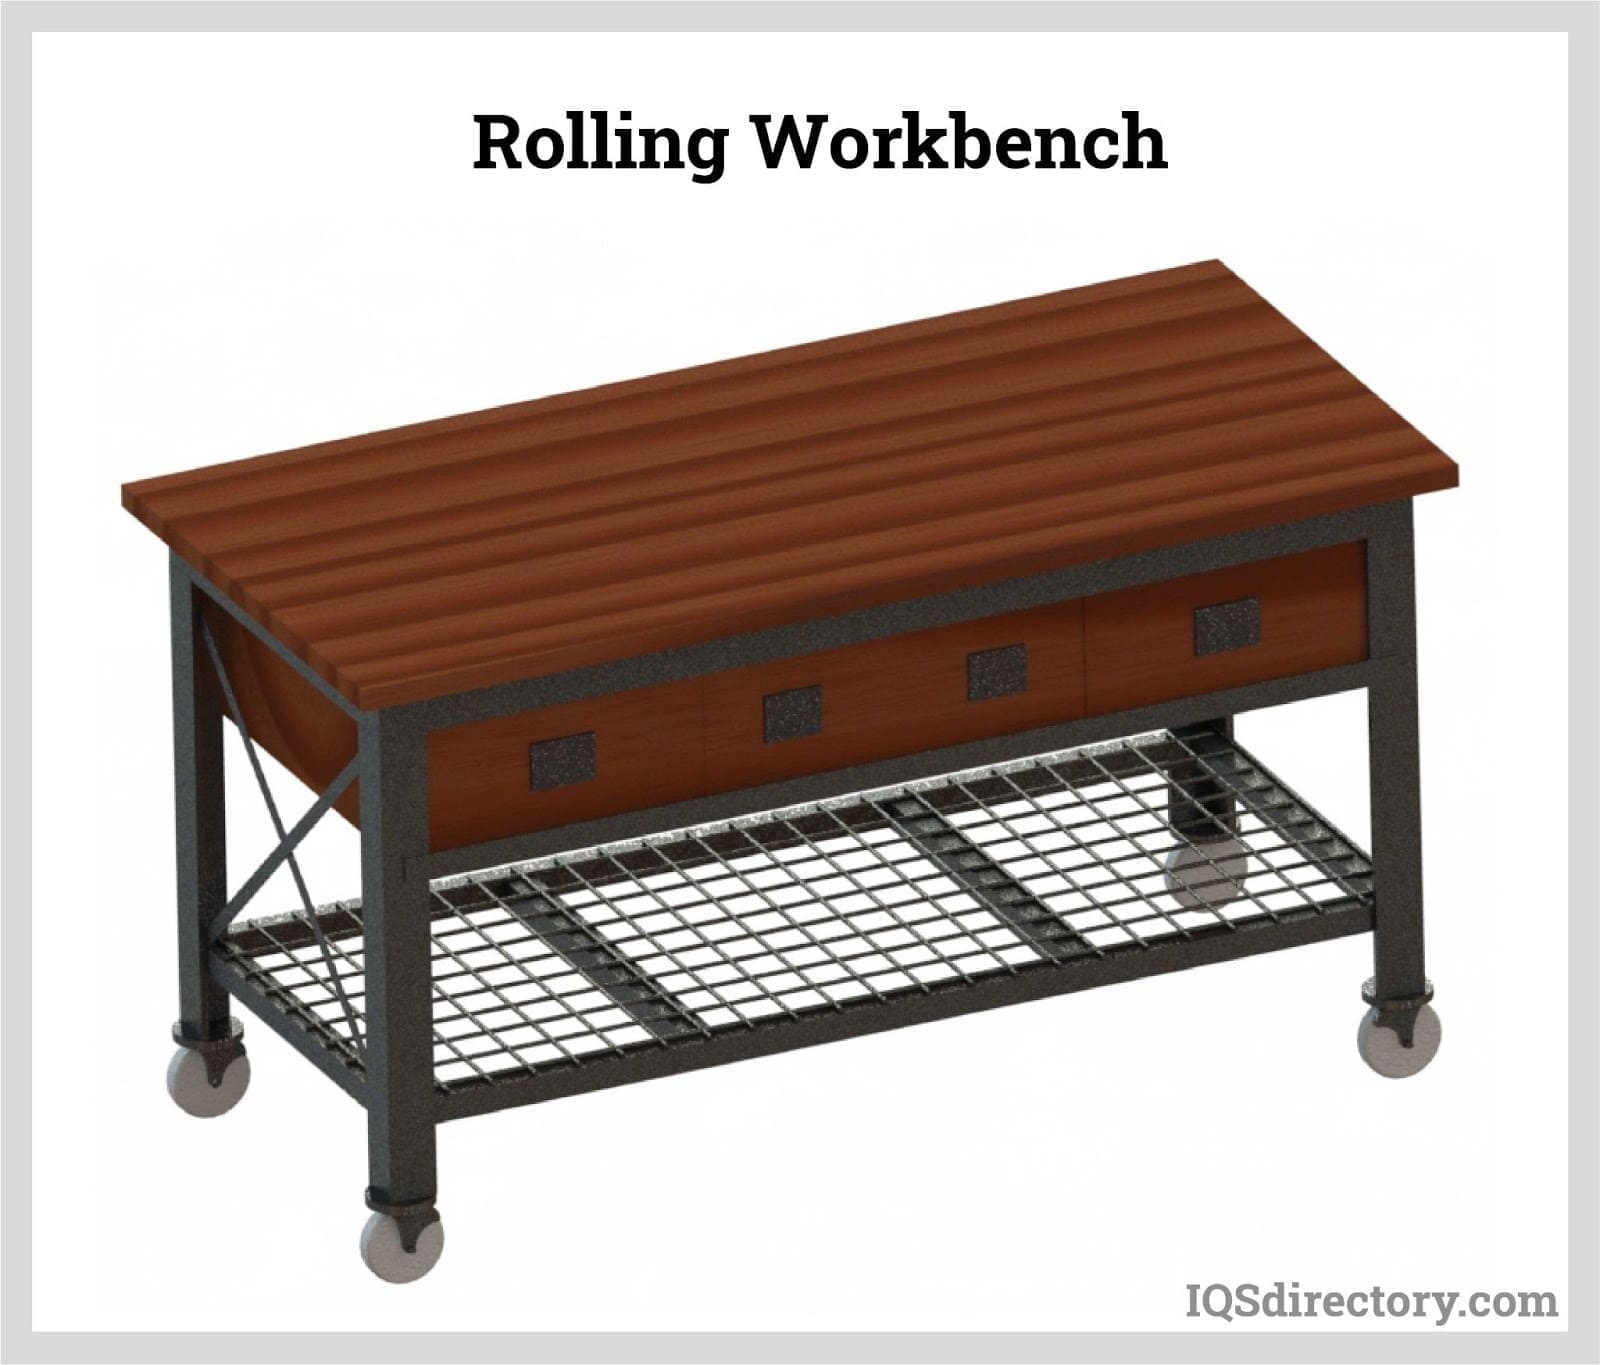 Rolling Workbench